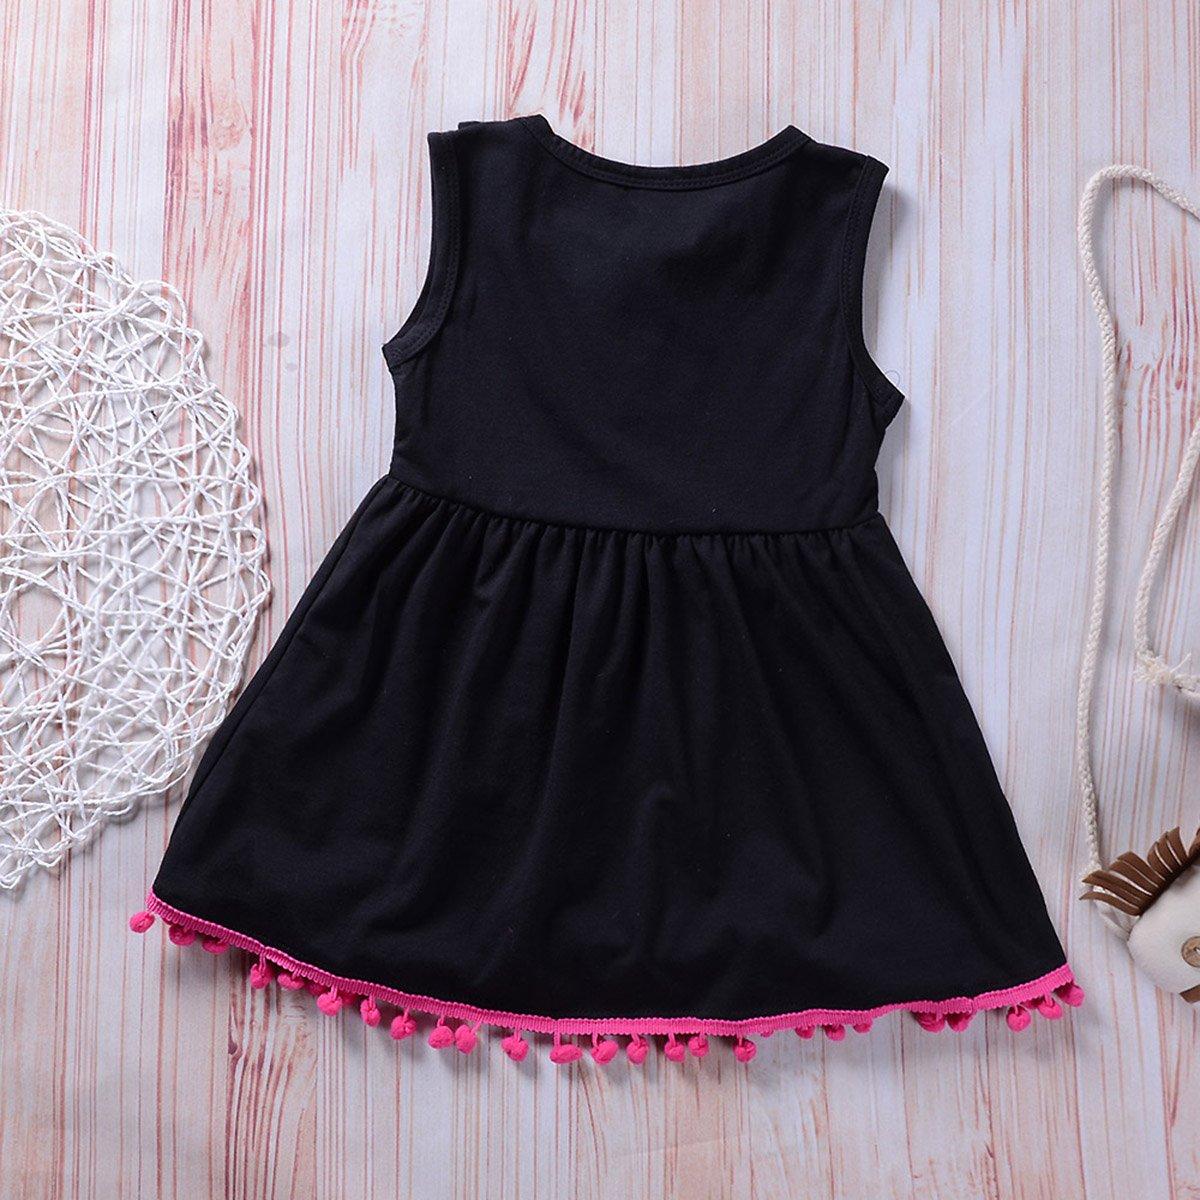 Toddler Baby Girls Sleeveless Ruffle Shirt Dress Tops with Pompom Tassels